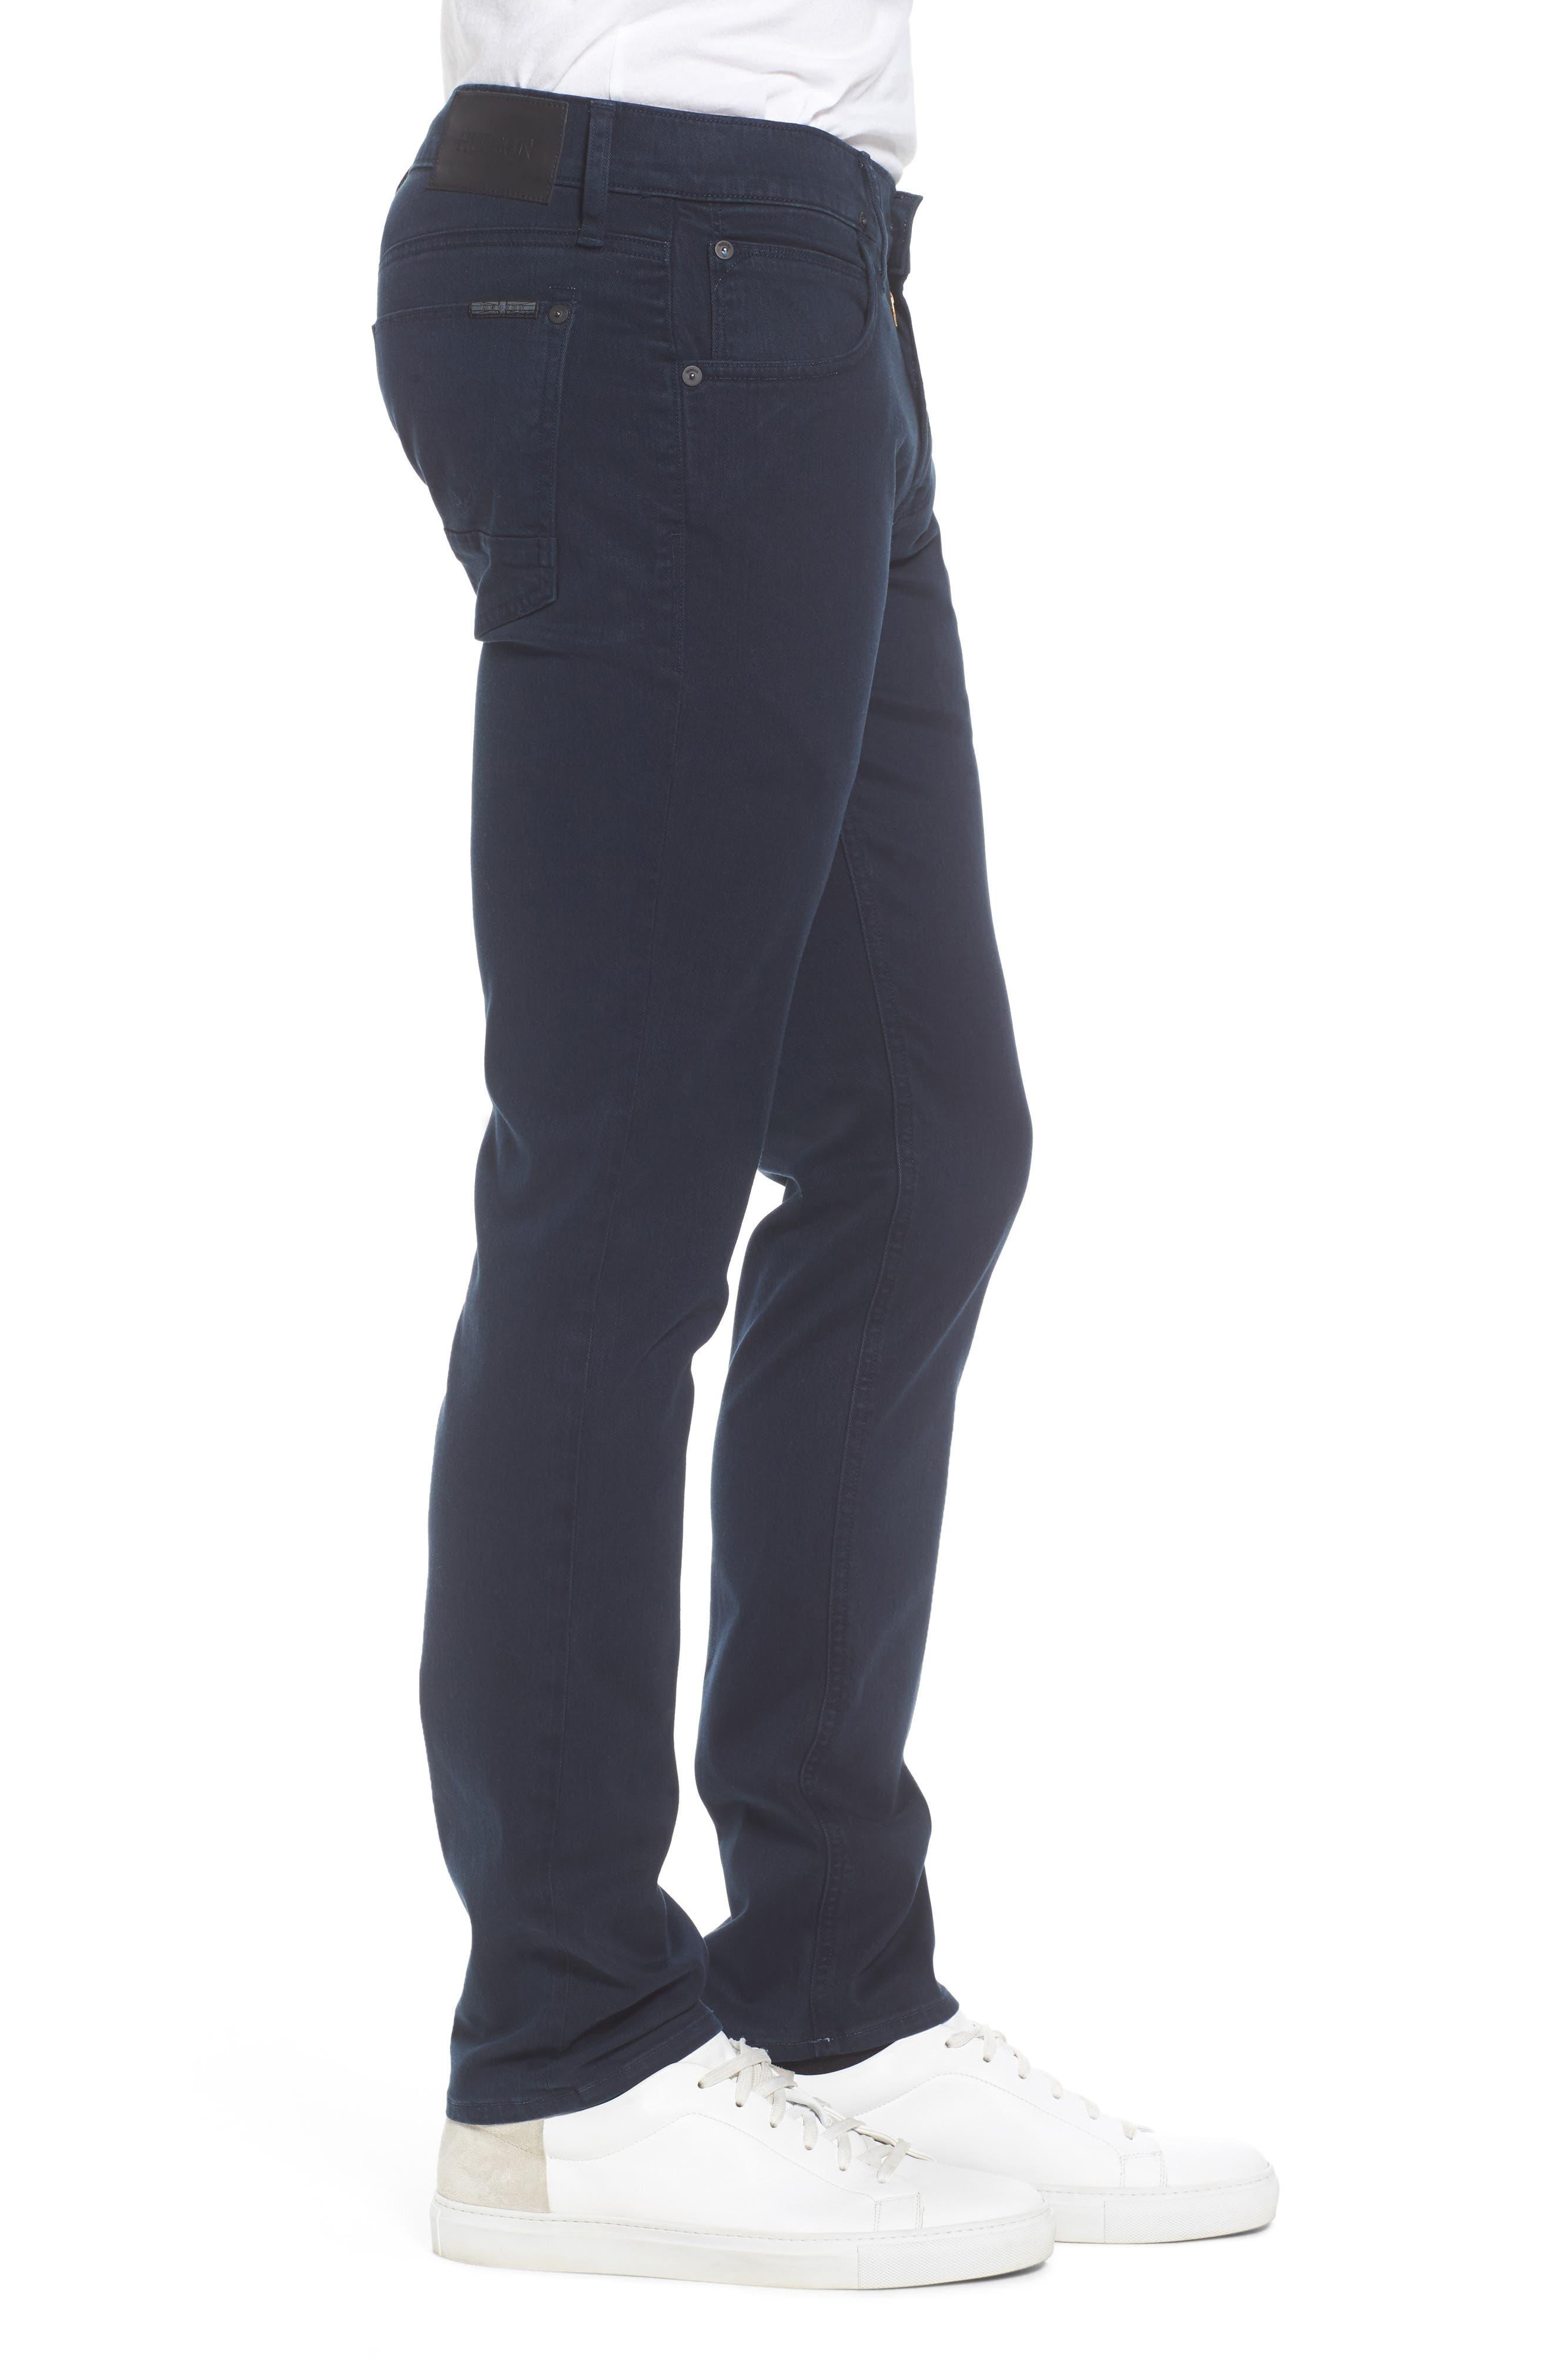 Blake Slim Fit Jeans,                             Alternate thumbnail 3, color,                             POLAR